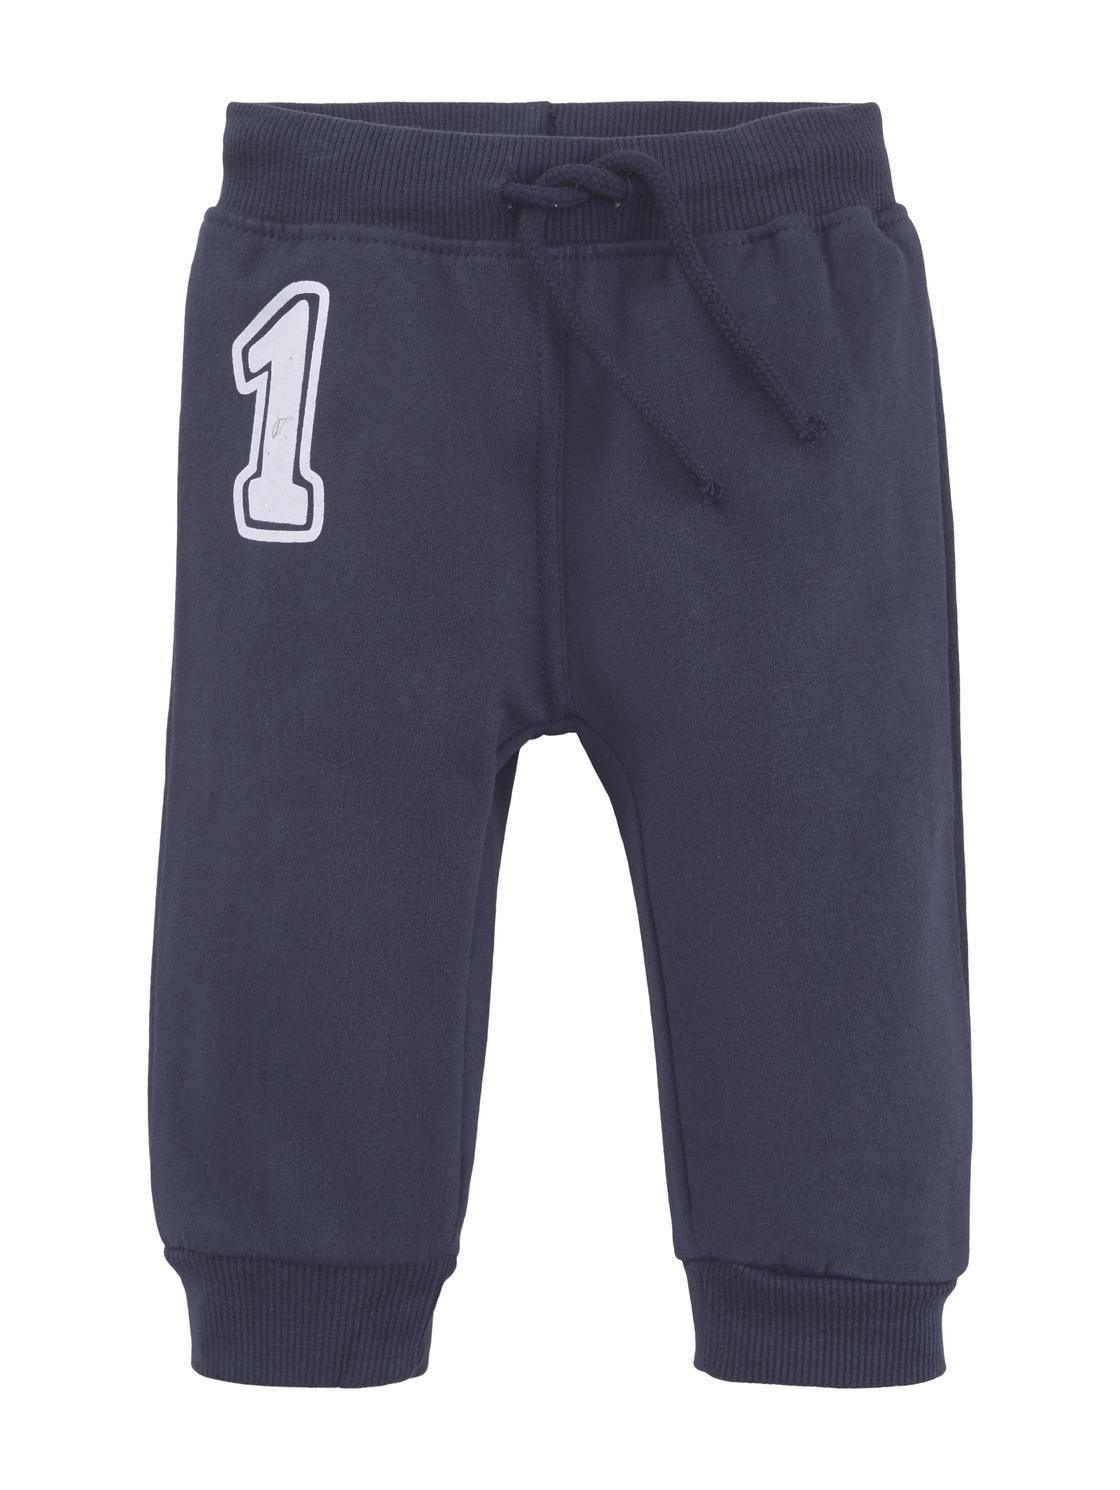 jogging pants striped, navy blazer-blue